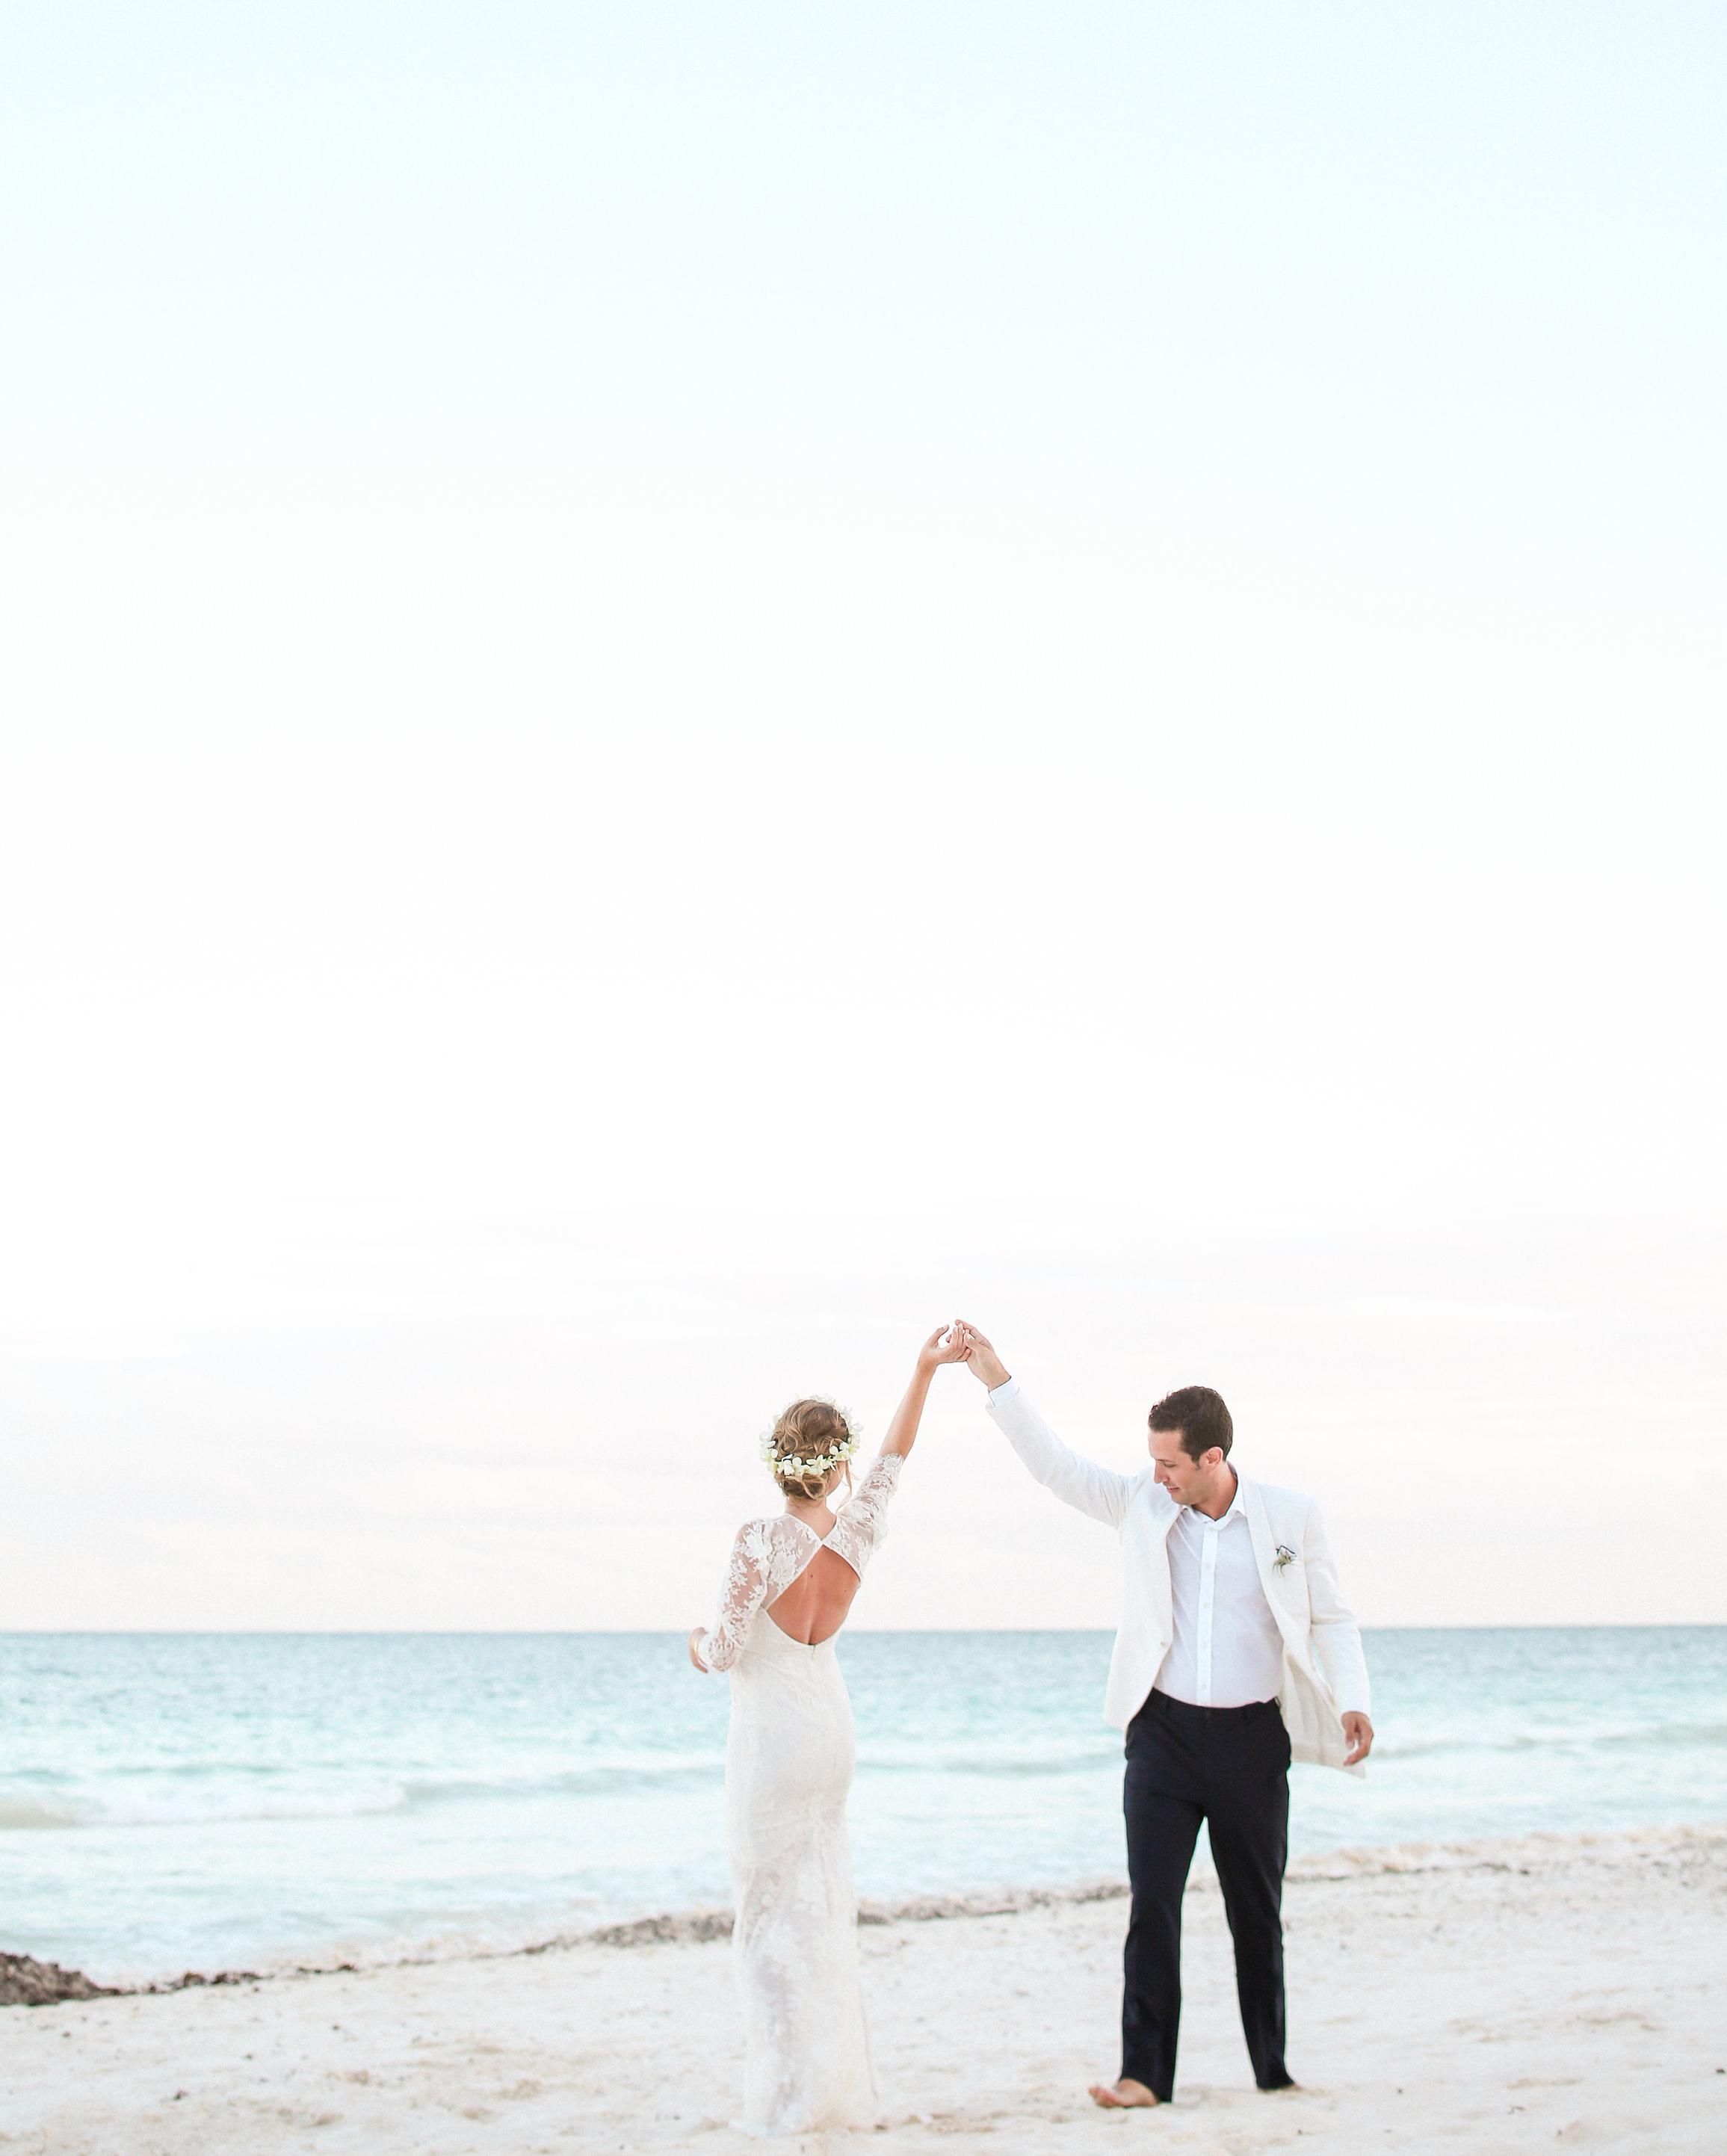 olivia-keith-wedding-couple-18-s112304-0815.jpg